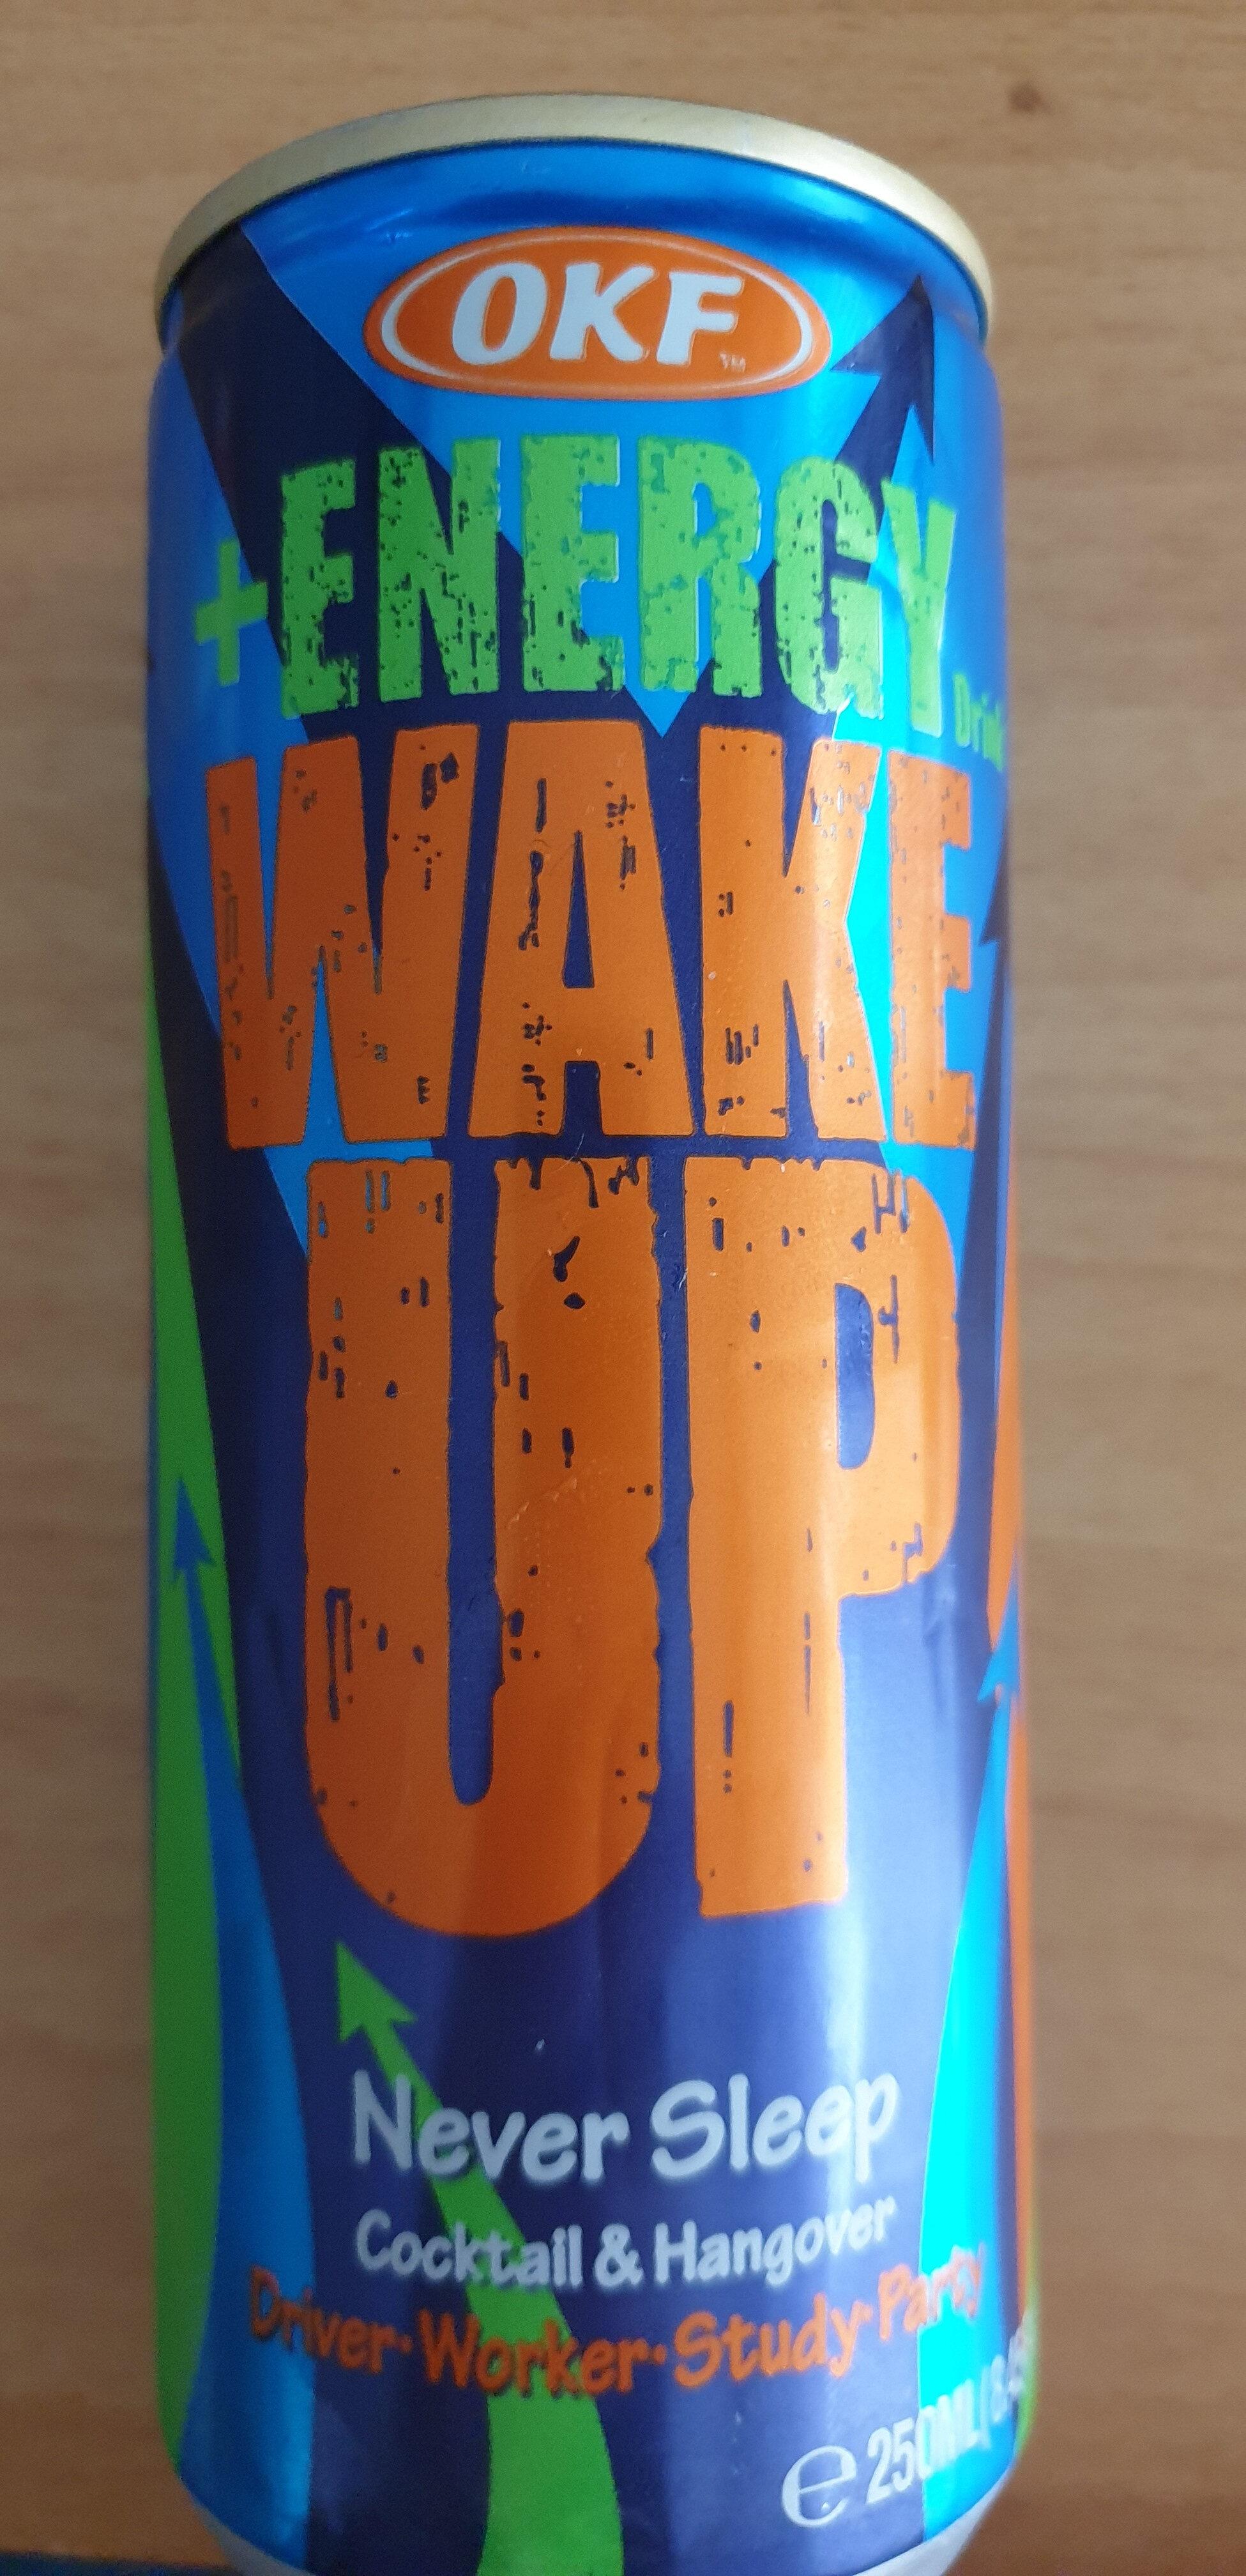 +Energy Wake Up - Prodotto - en